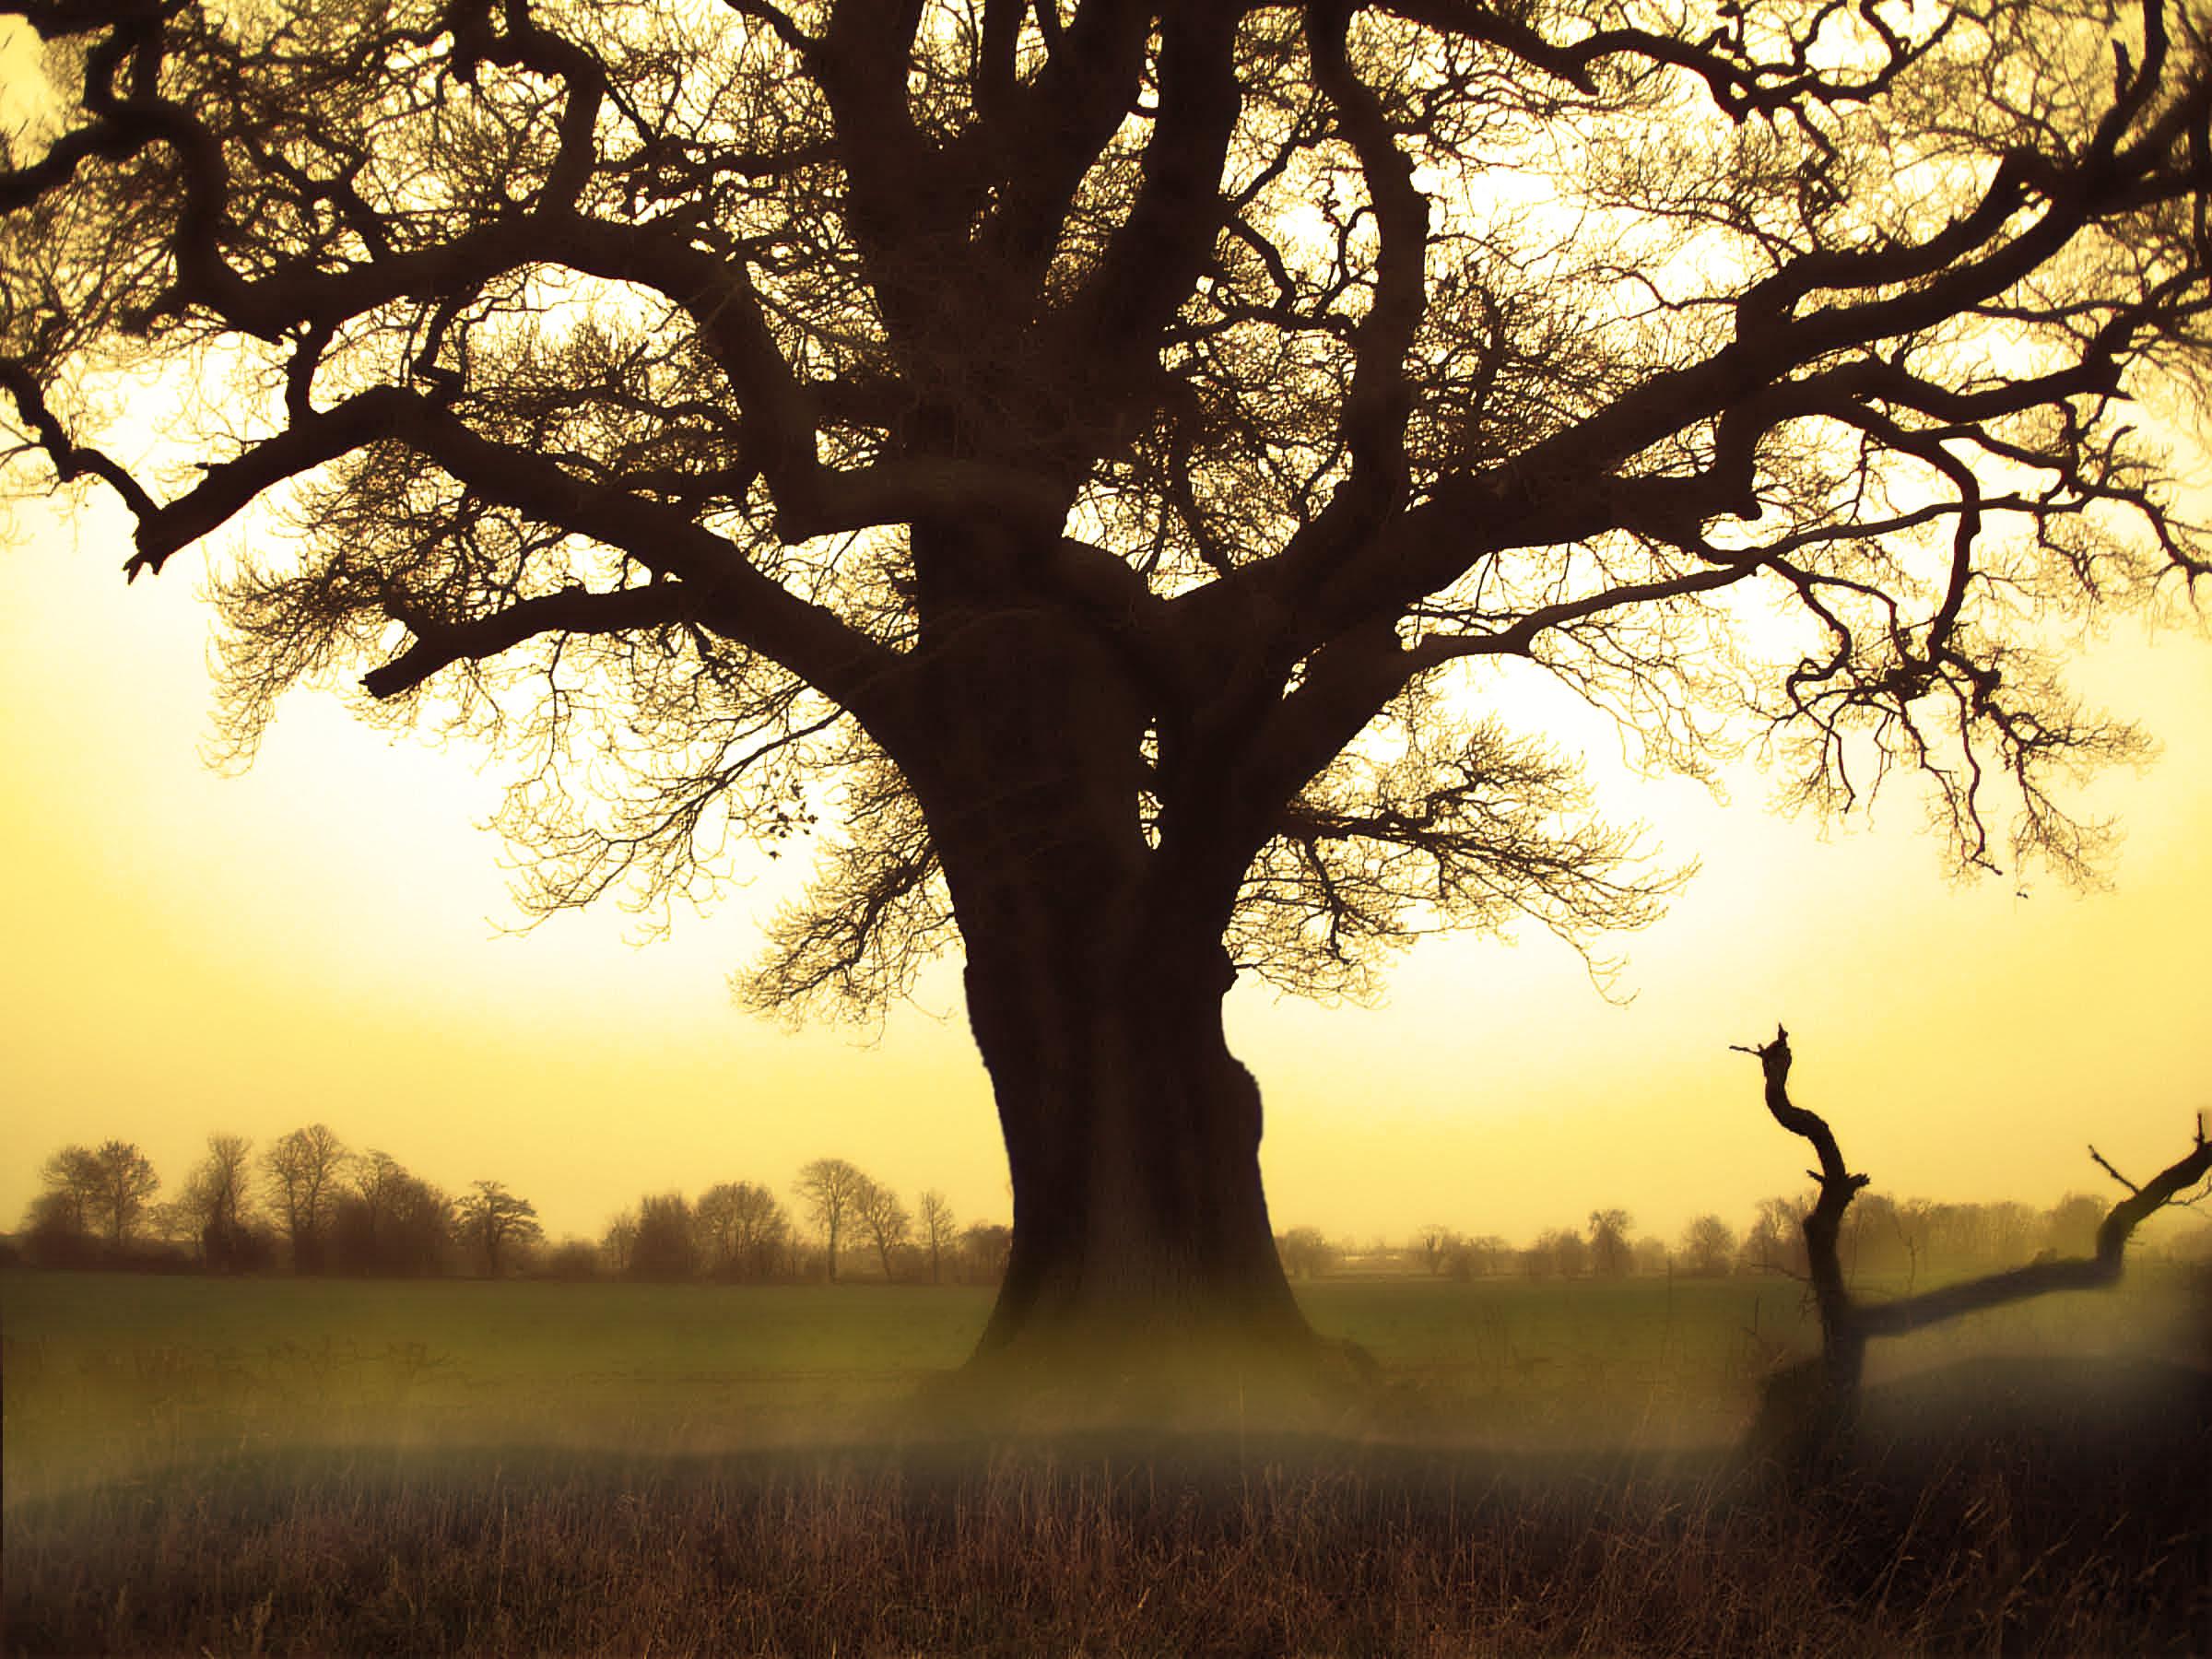 sun fog sunrise trees - photo #21